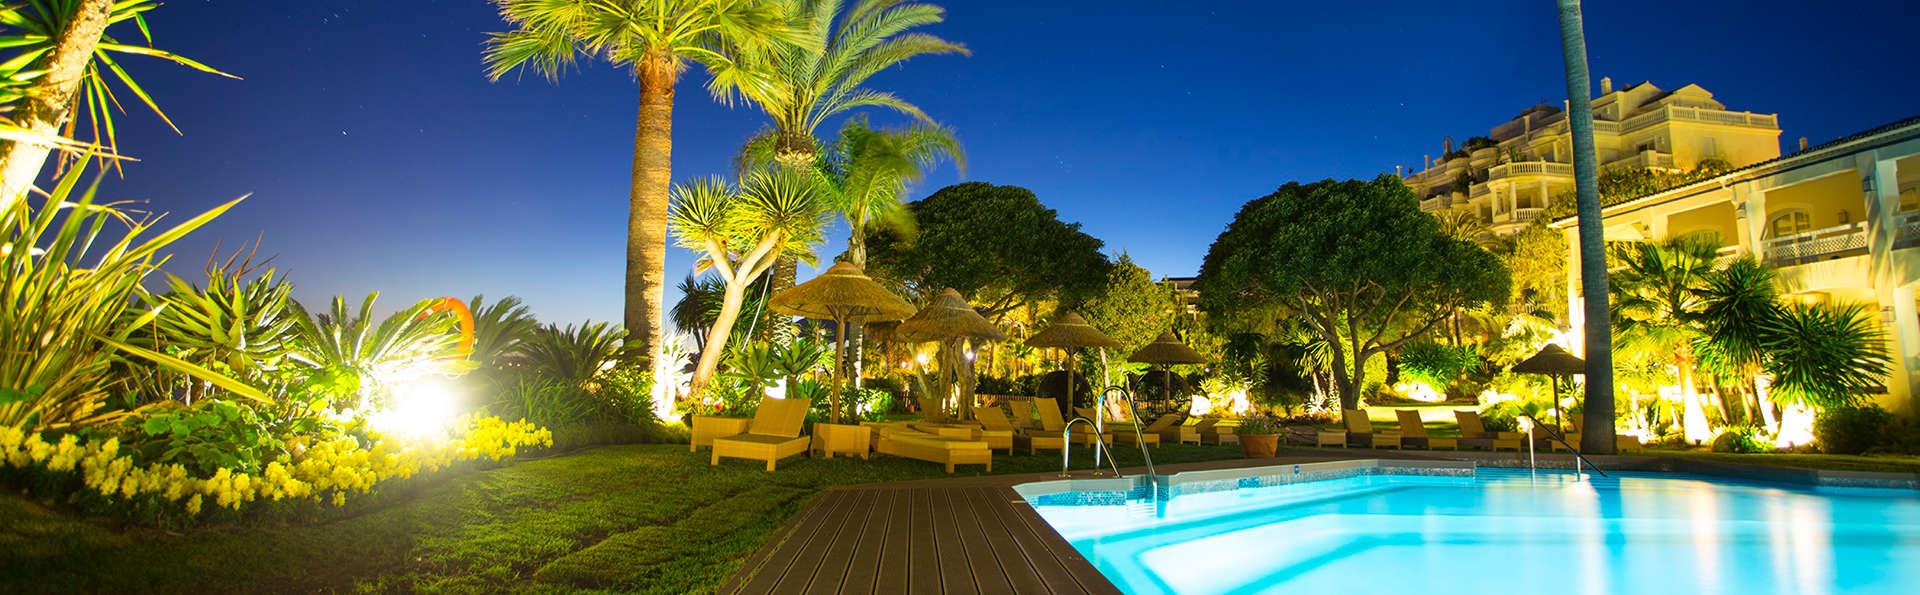 Healthouse Las Dunas - EDIT_pool.jpg